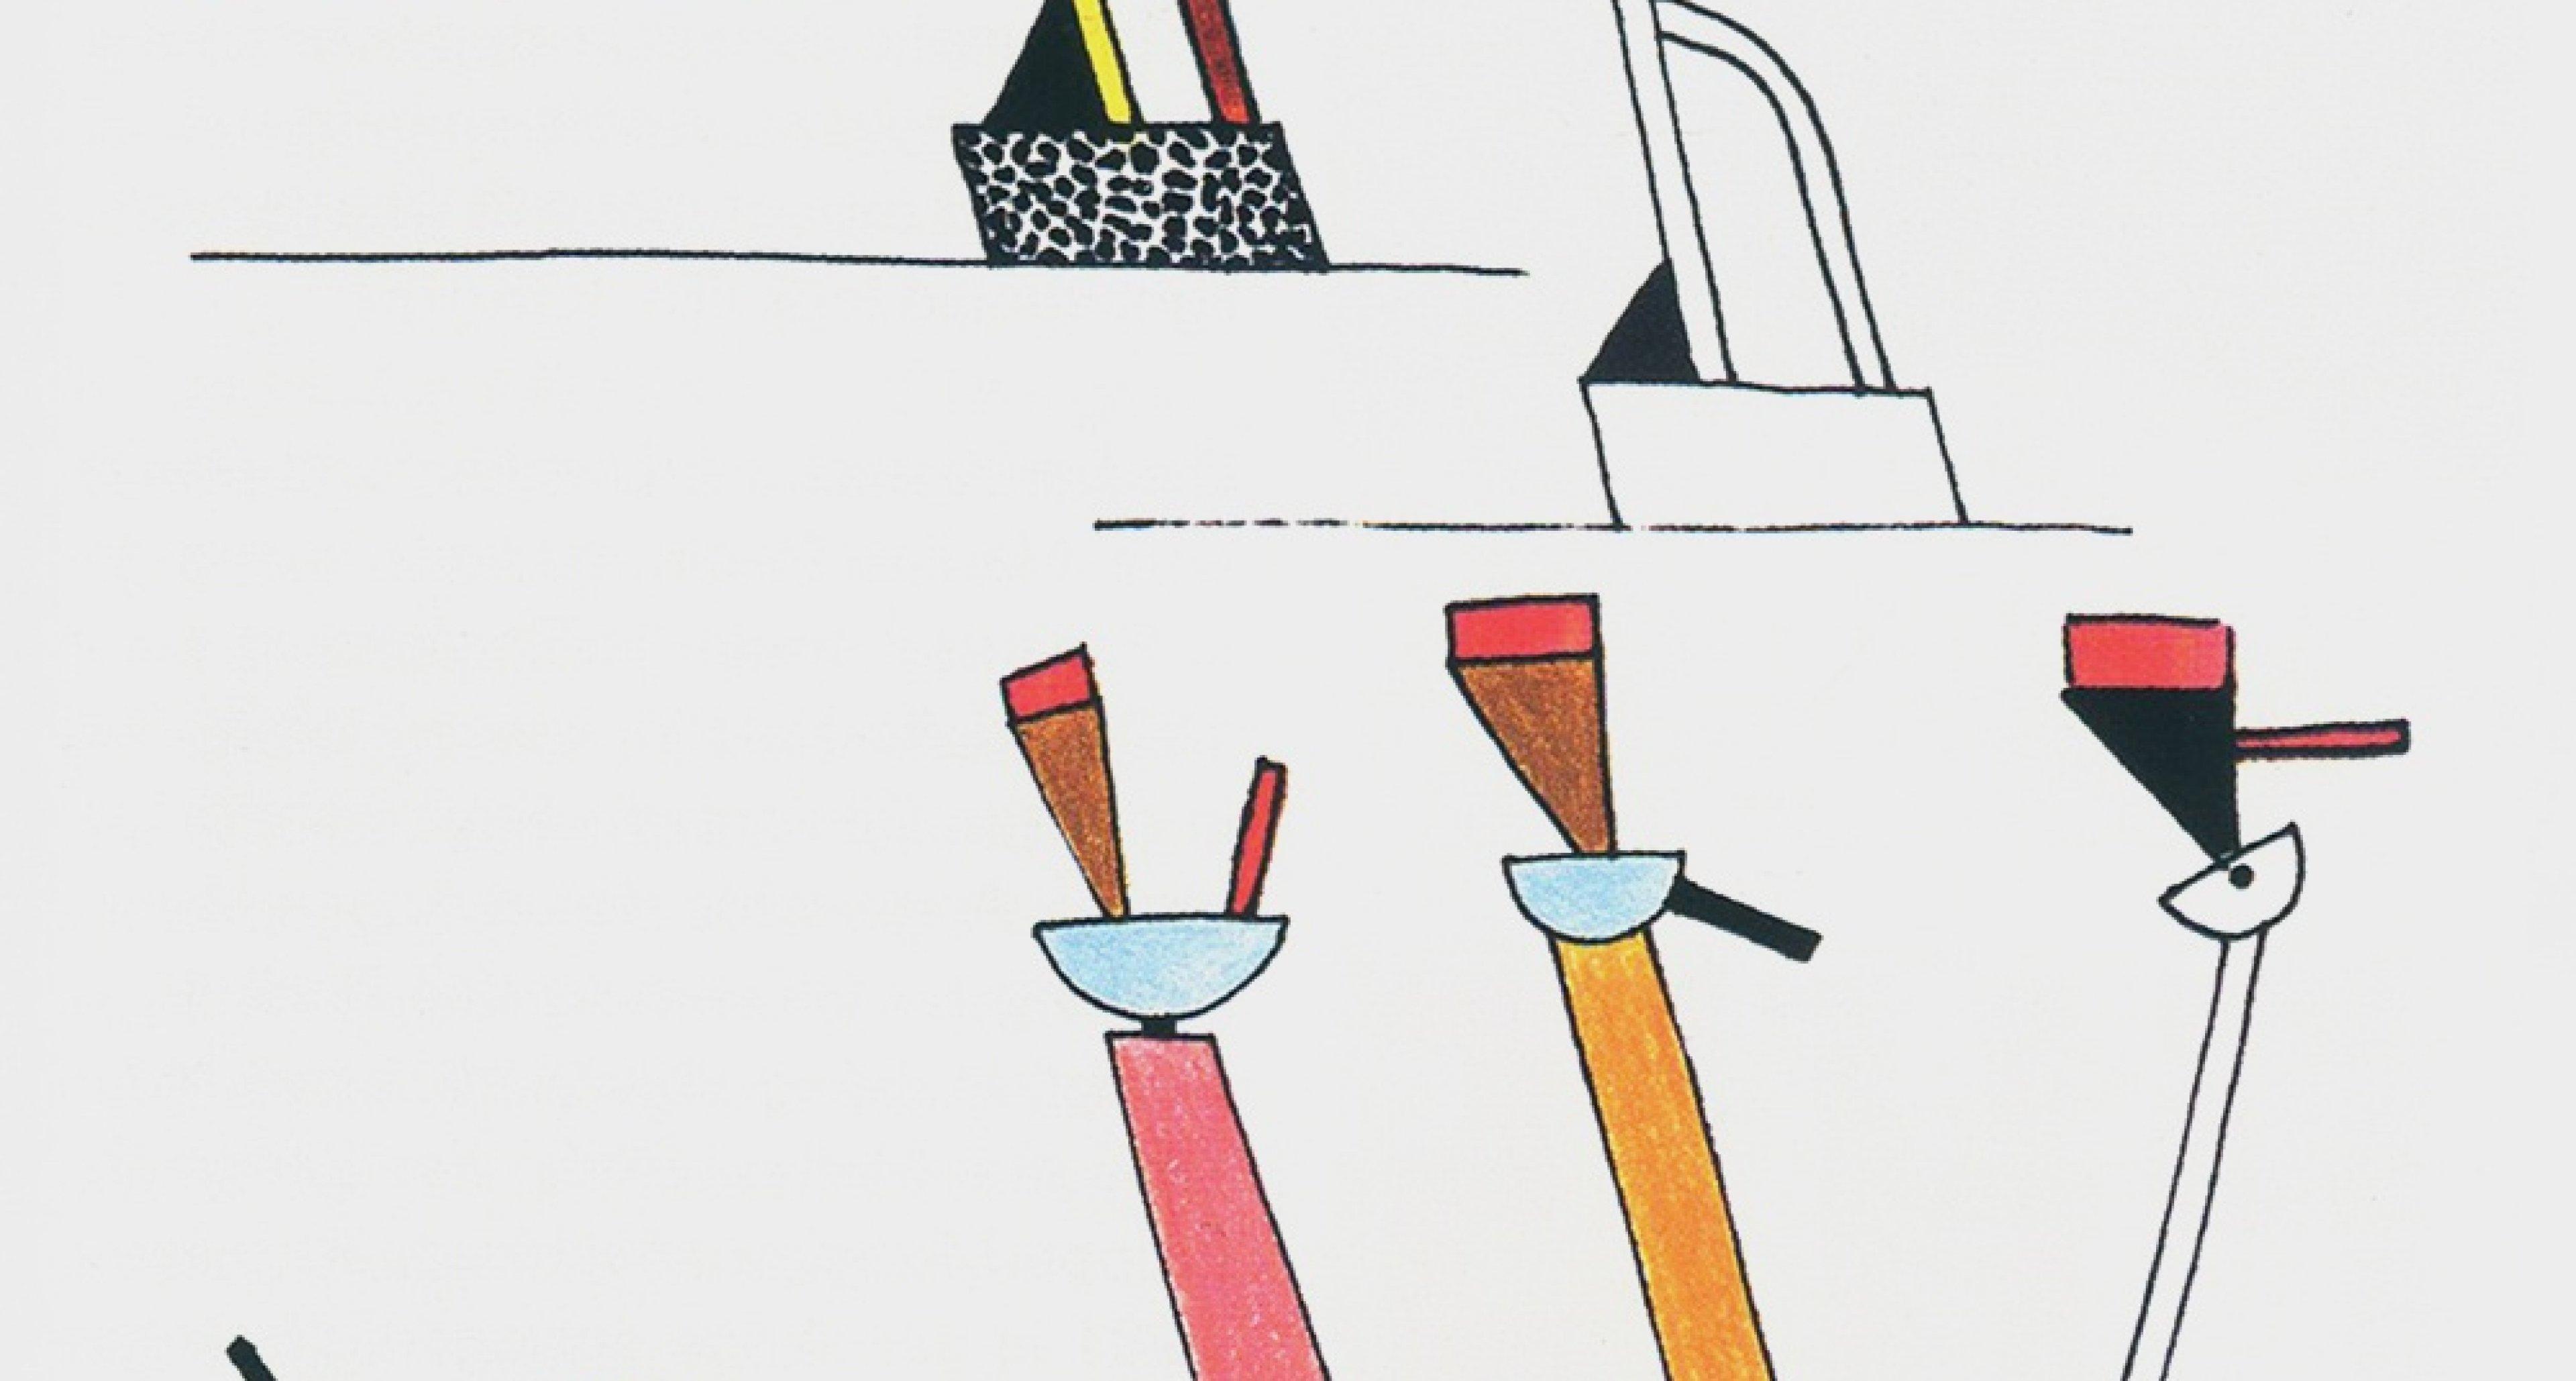 Drawings for lamps Tahiti and Cavalieri, 1981.